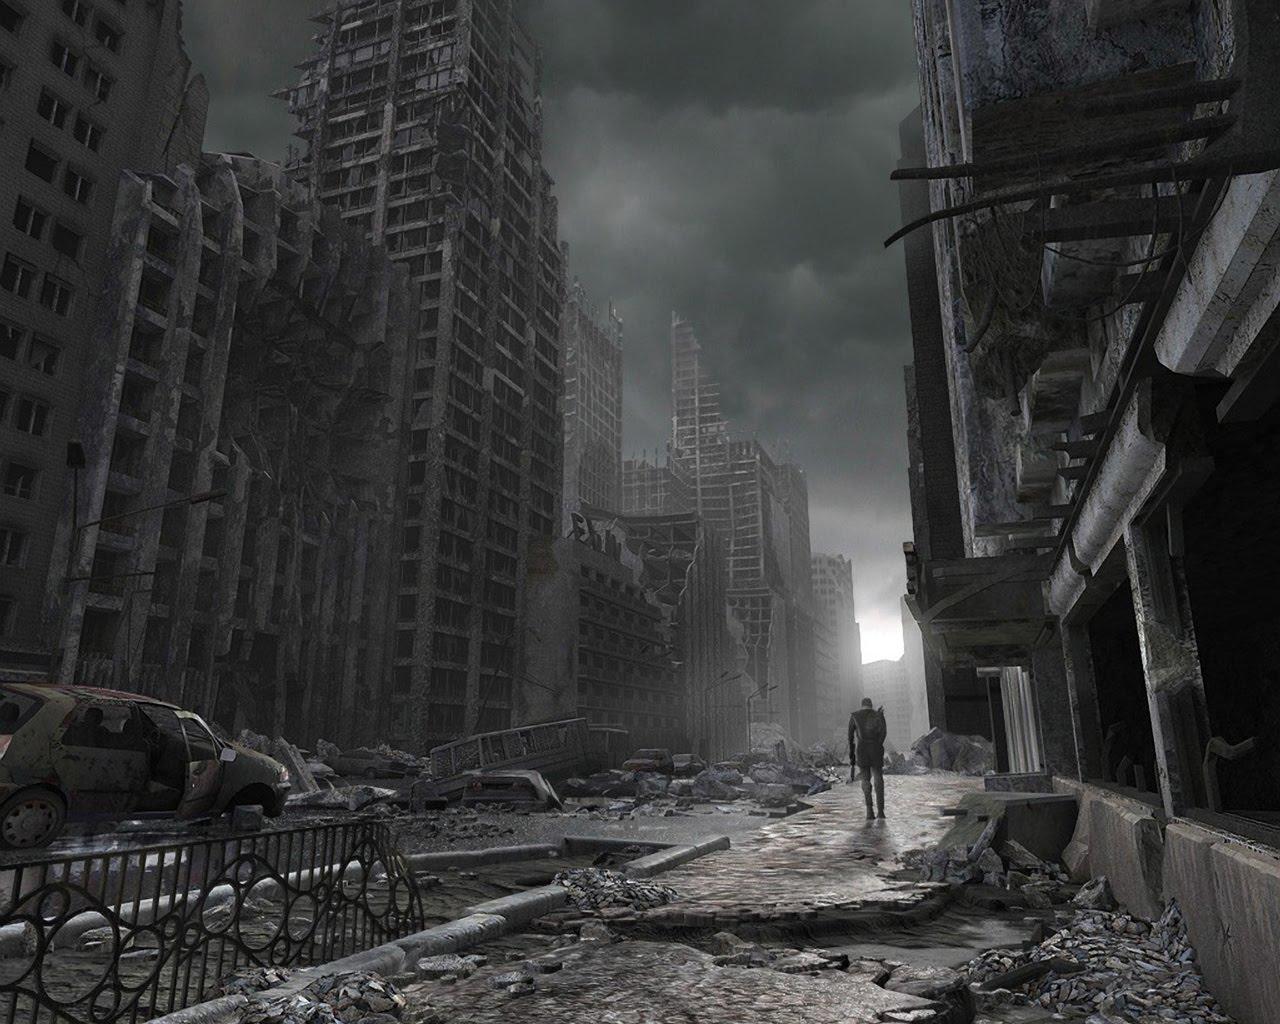 17730 1 miscellaneous digital art apocalyptic destruction destroyed city.jpeg